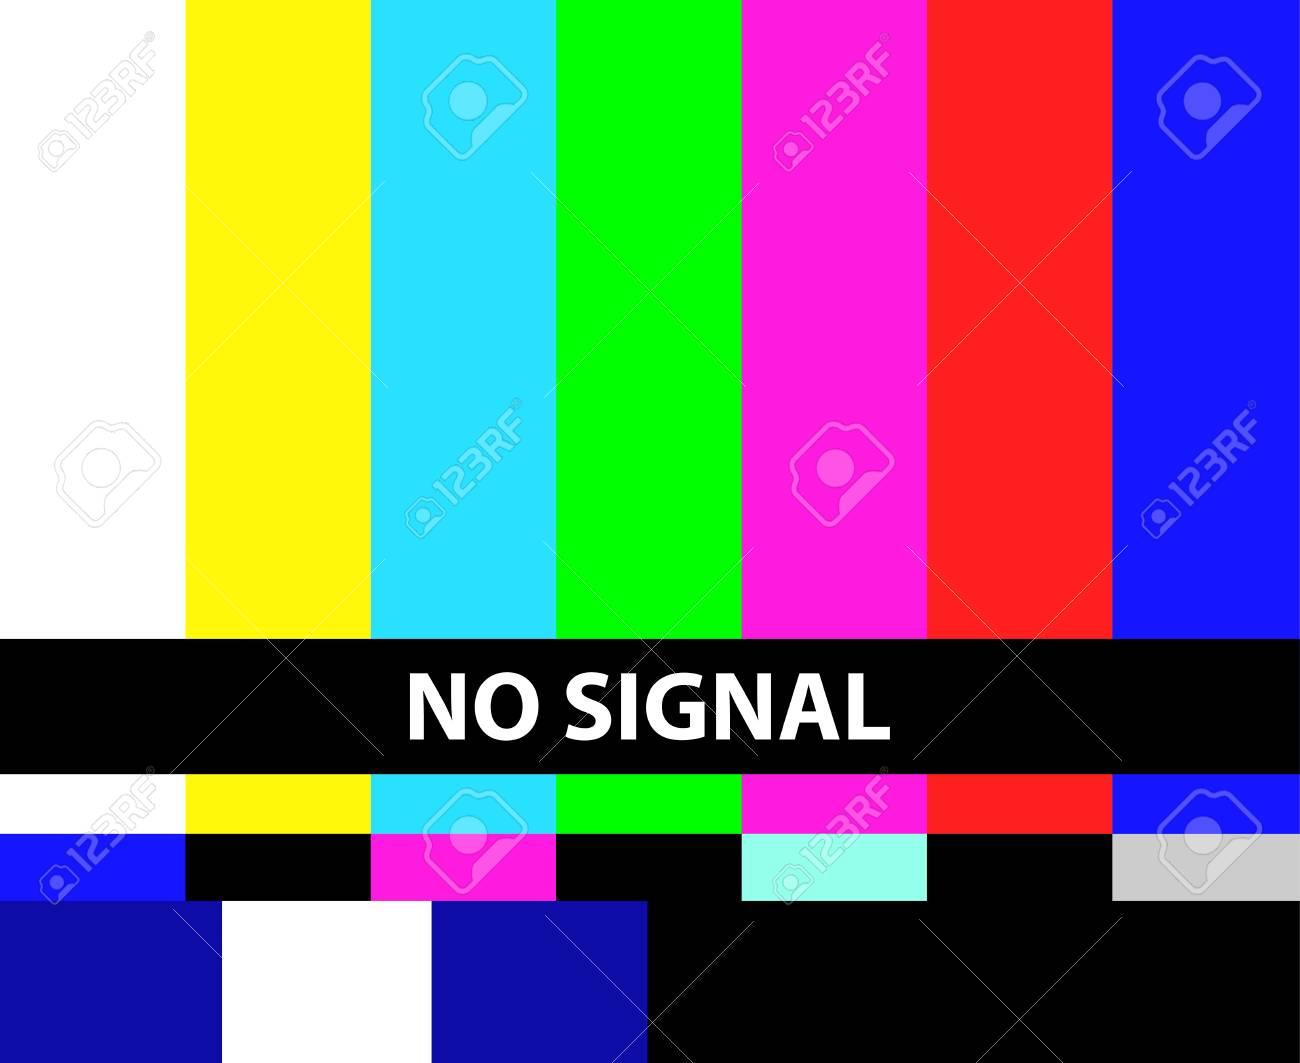 No TV signal illustration - 92591237